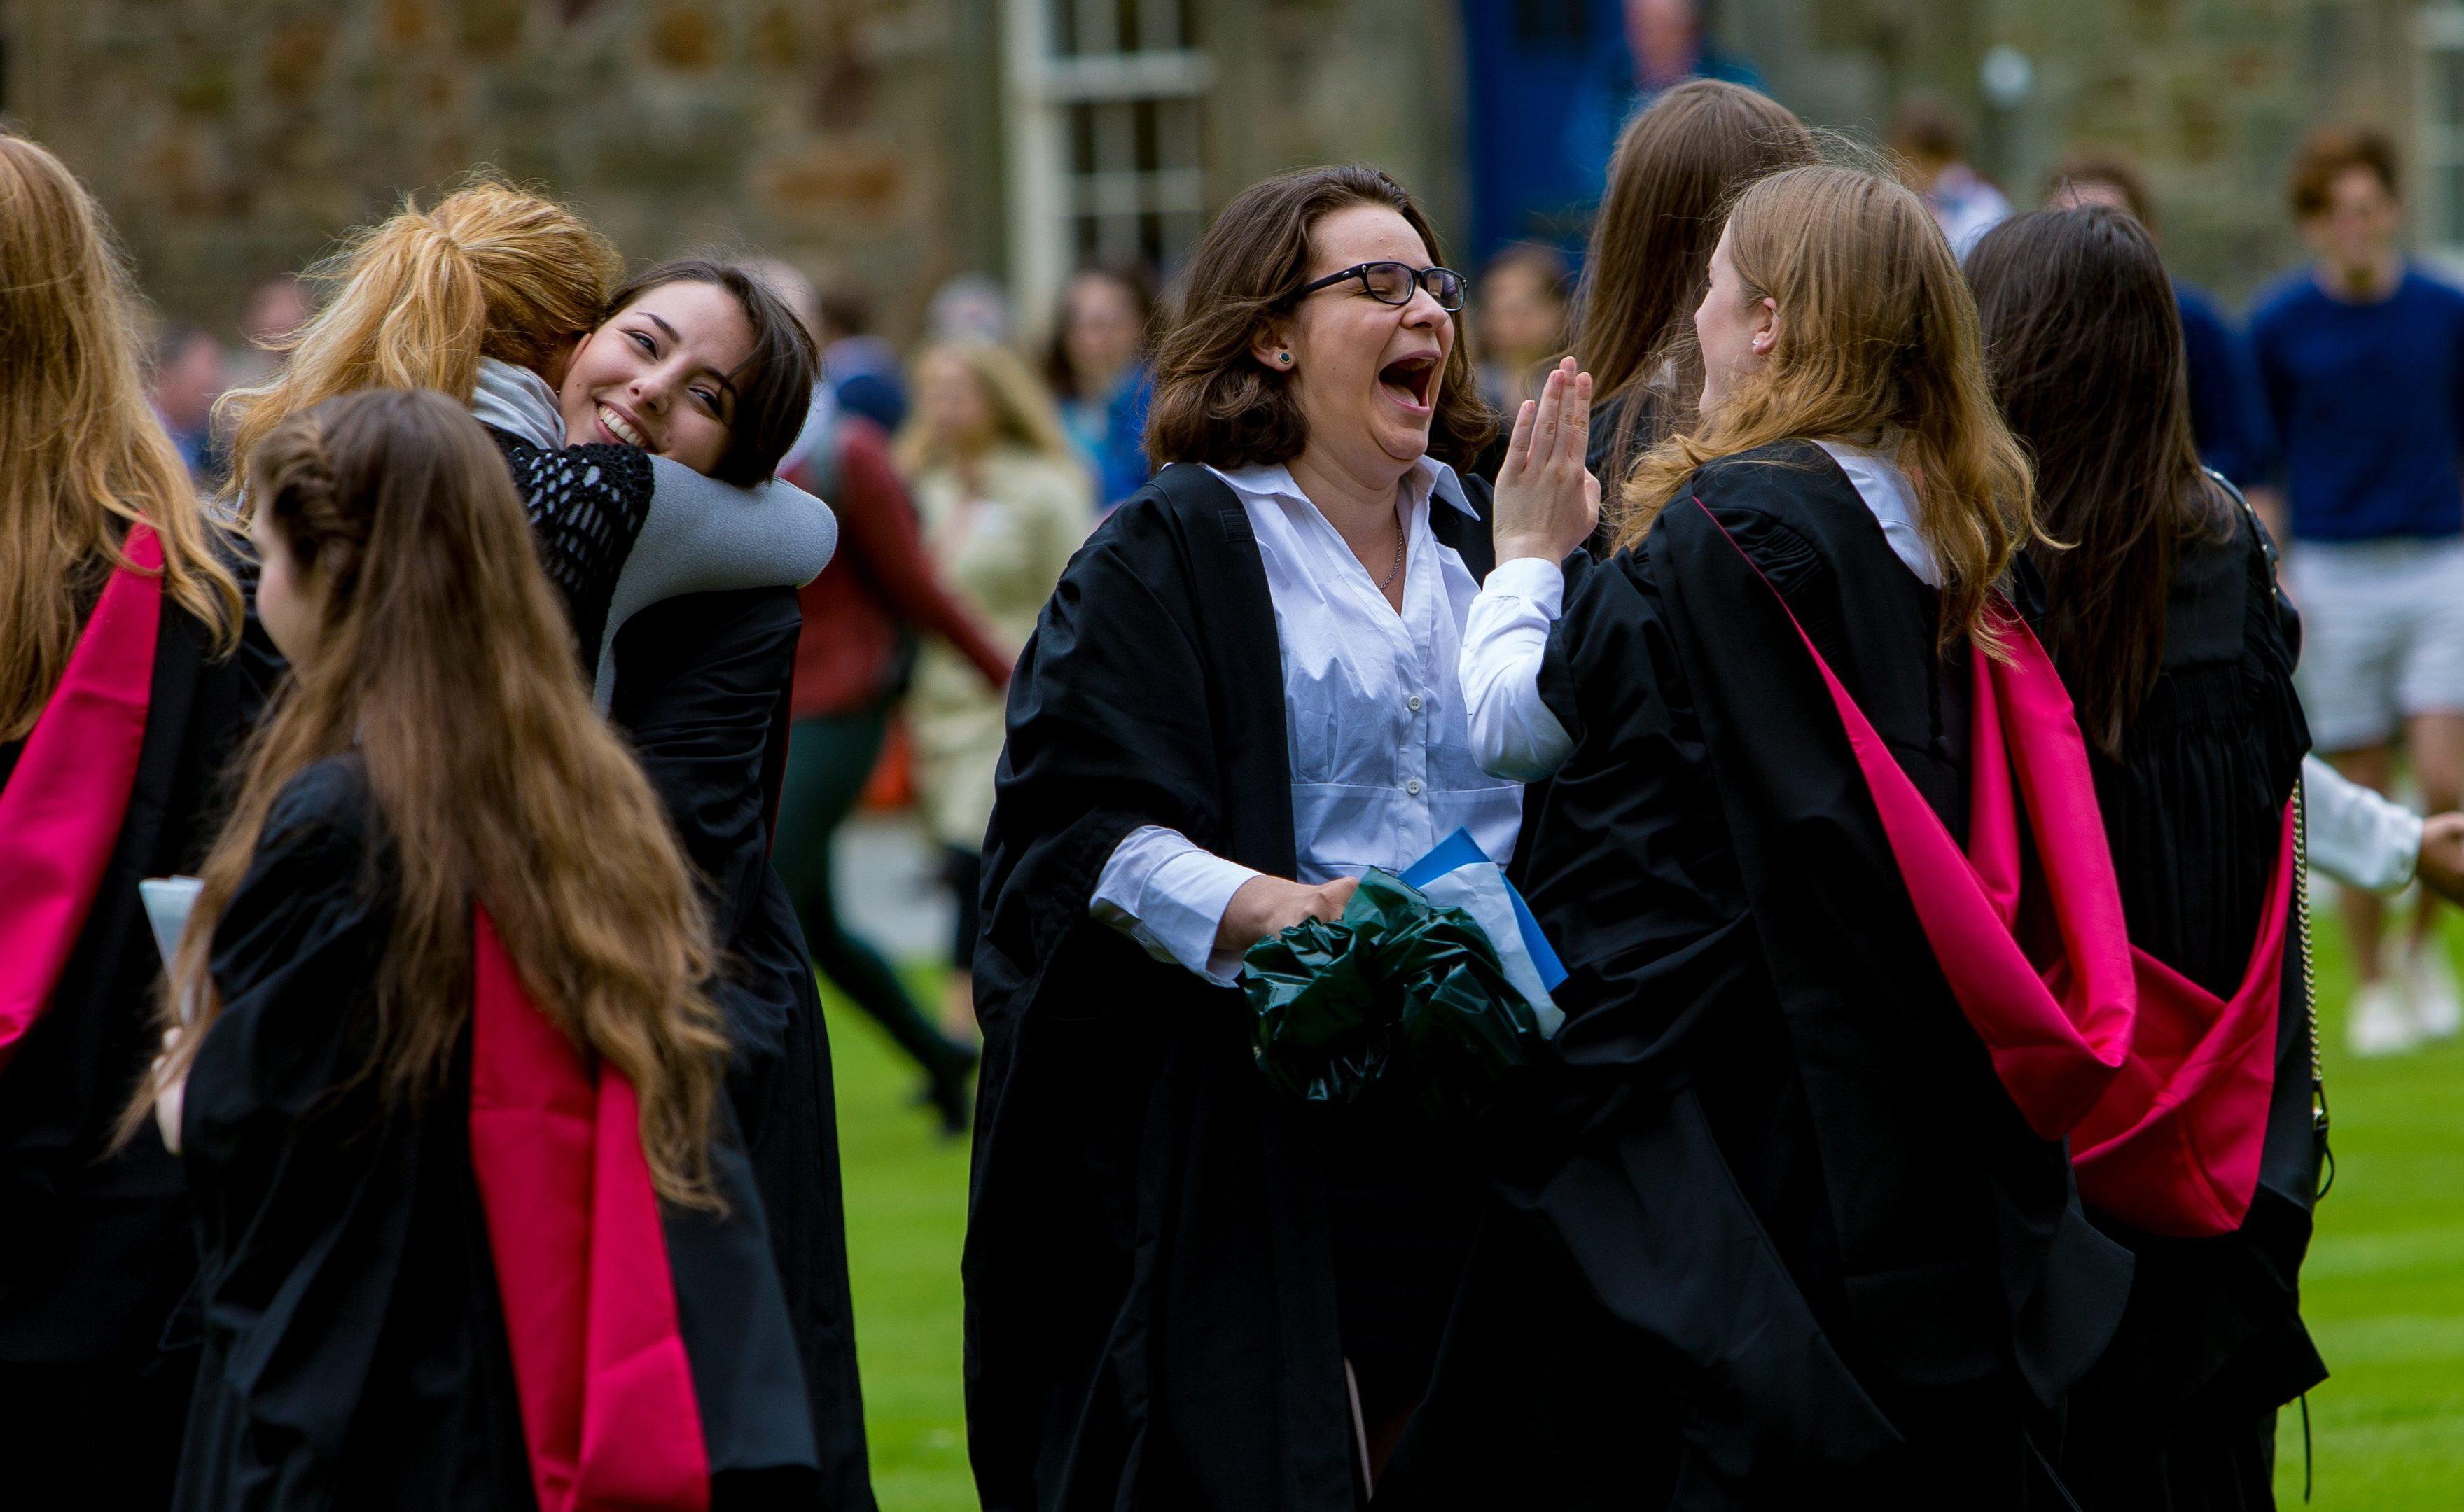 Students celebrate in St Salvators Quadrangle.